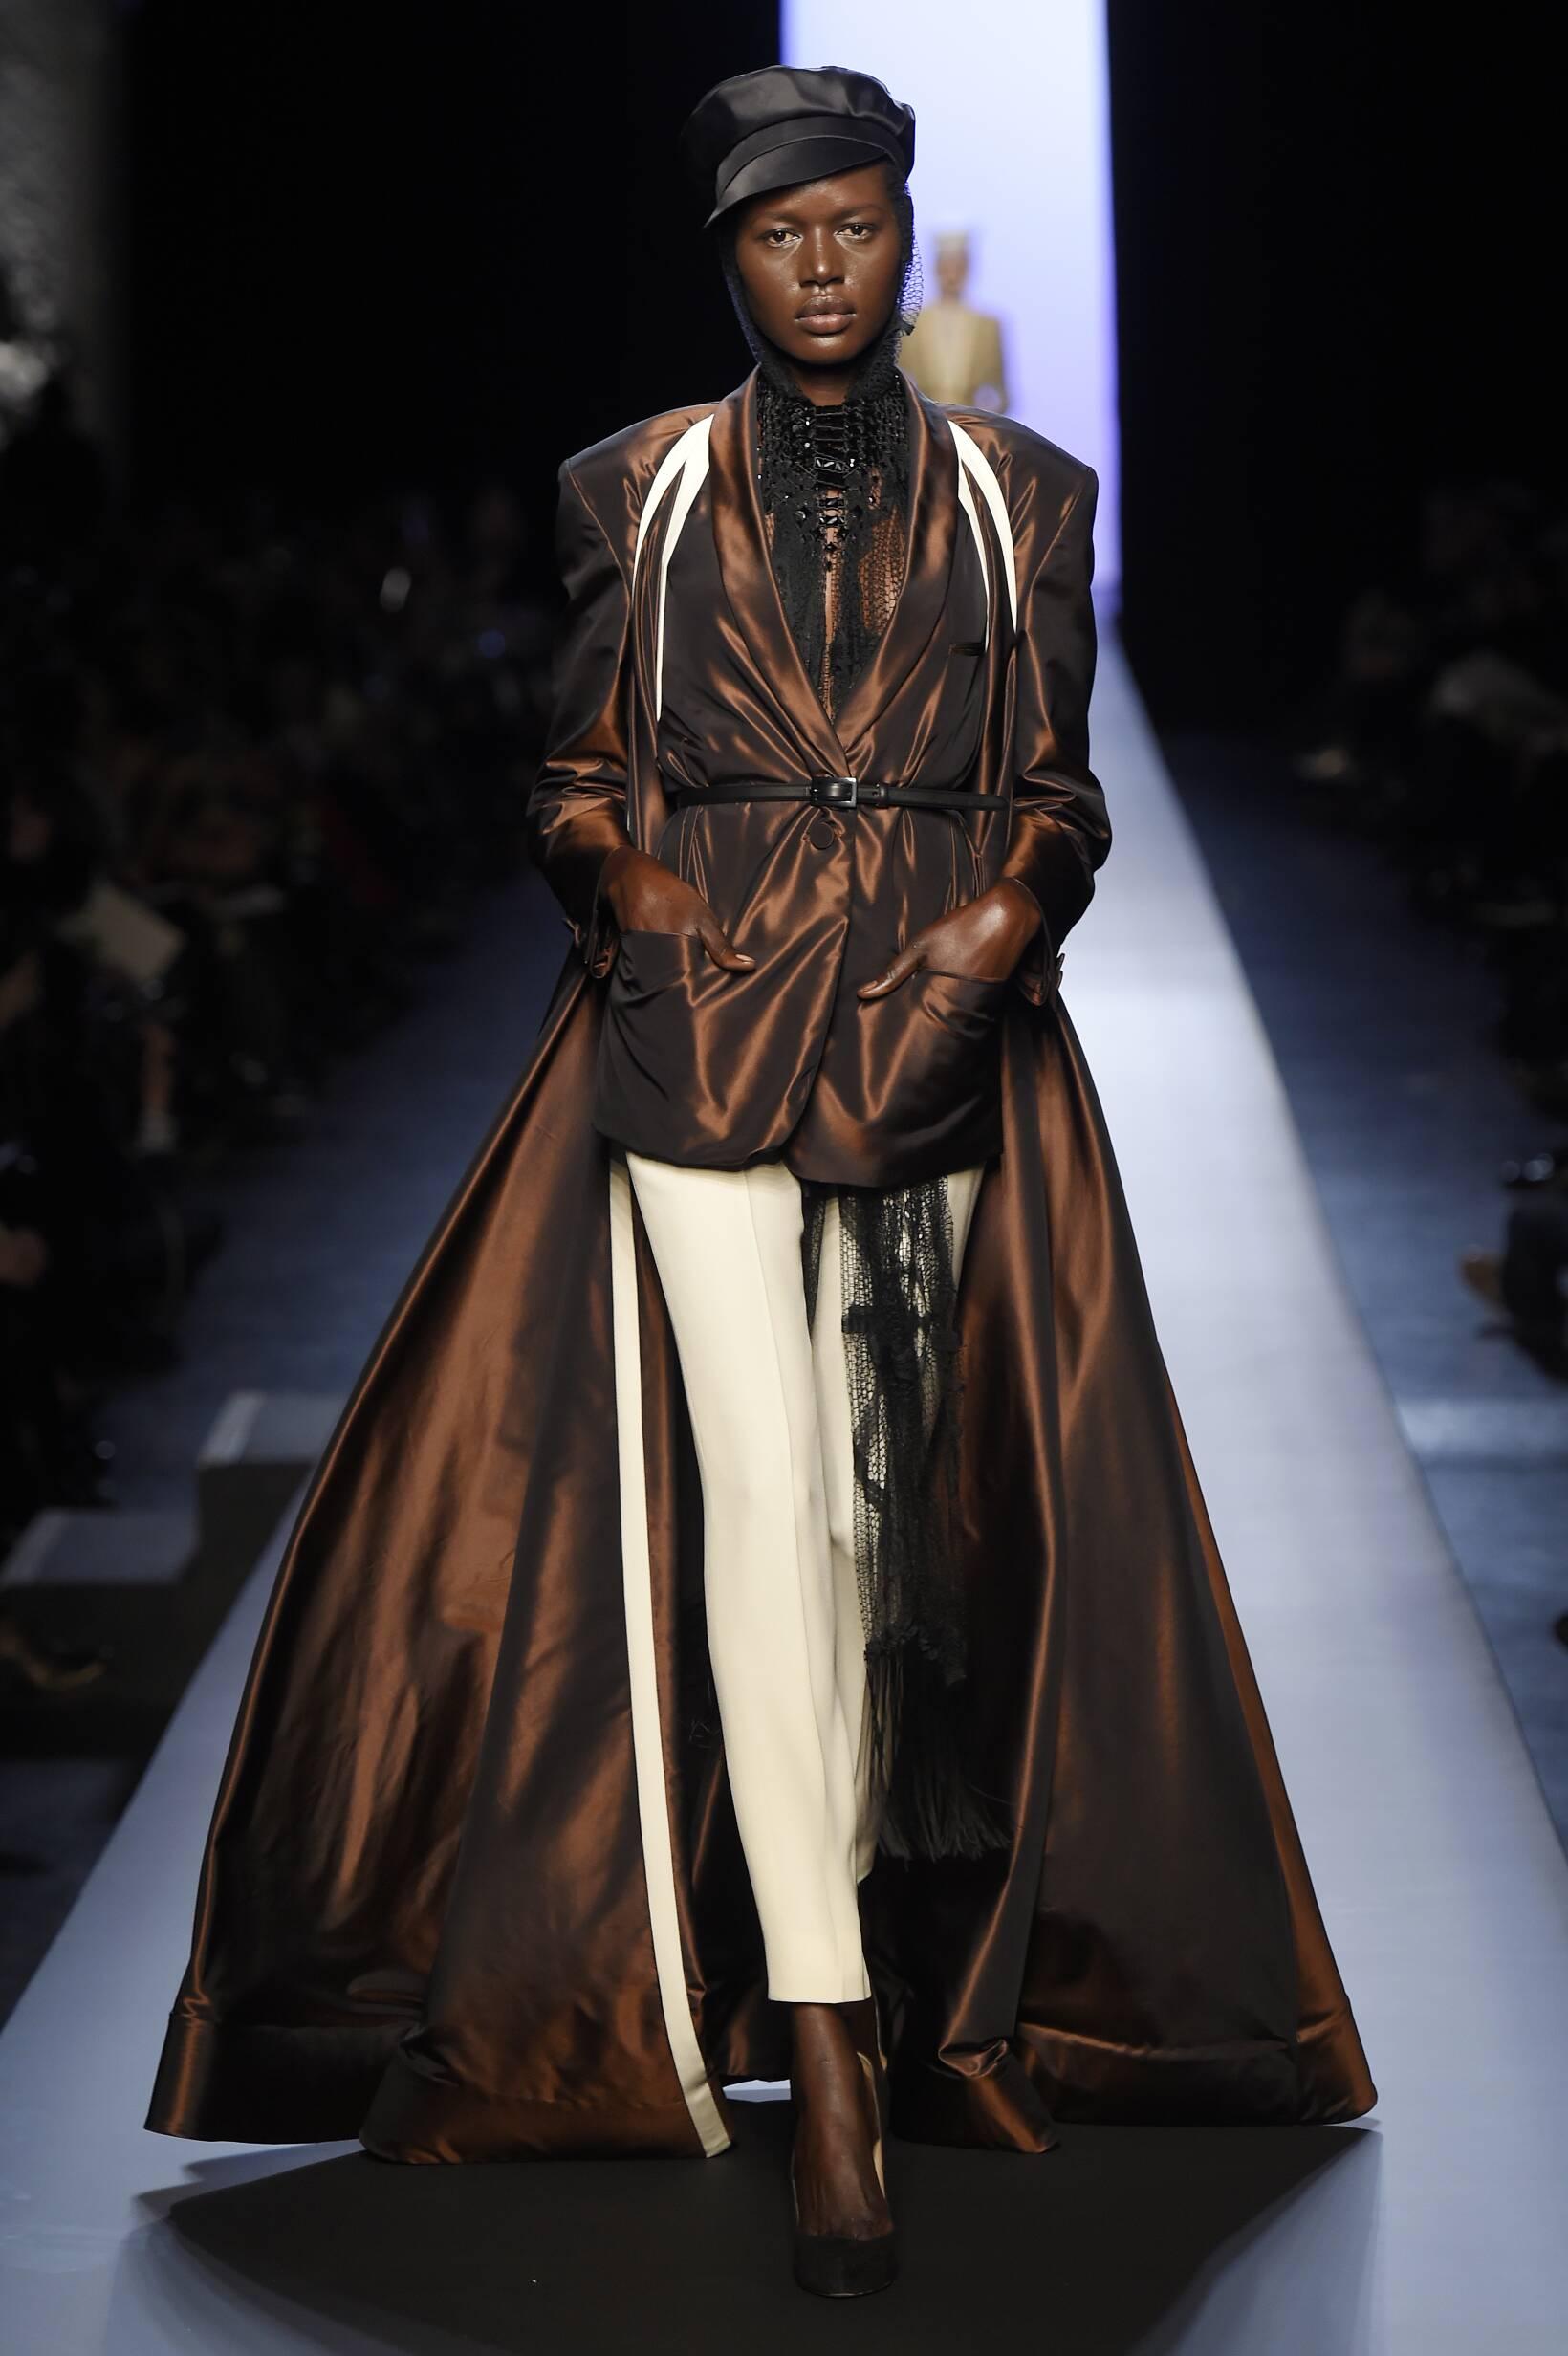 Catwalk Jean Paul Gaultier Haute Couture Womenswear Collection Summer 2015